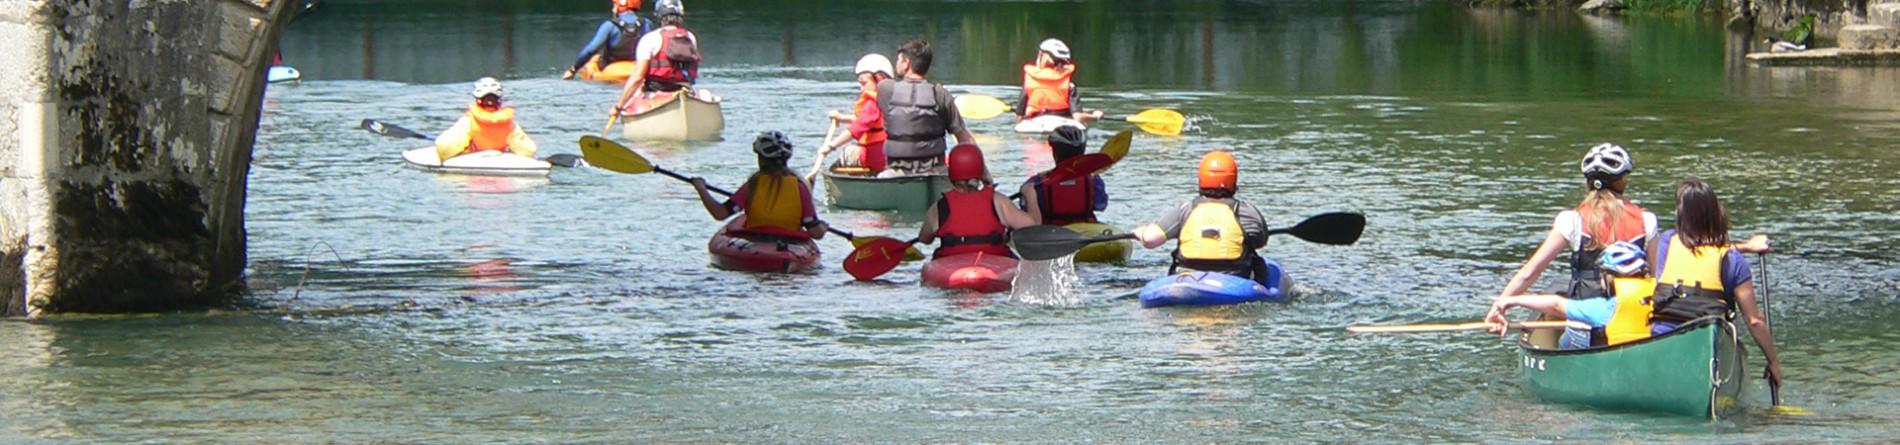 Kanusport ist Familiensport